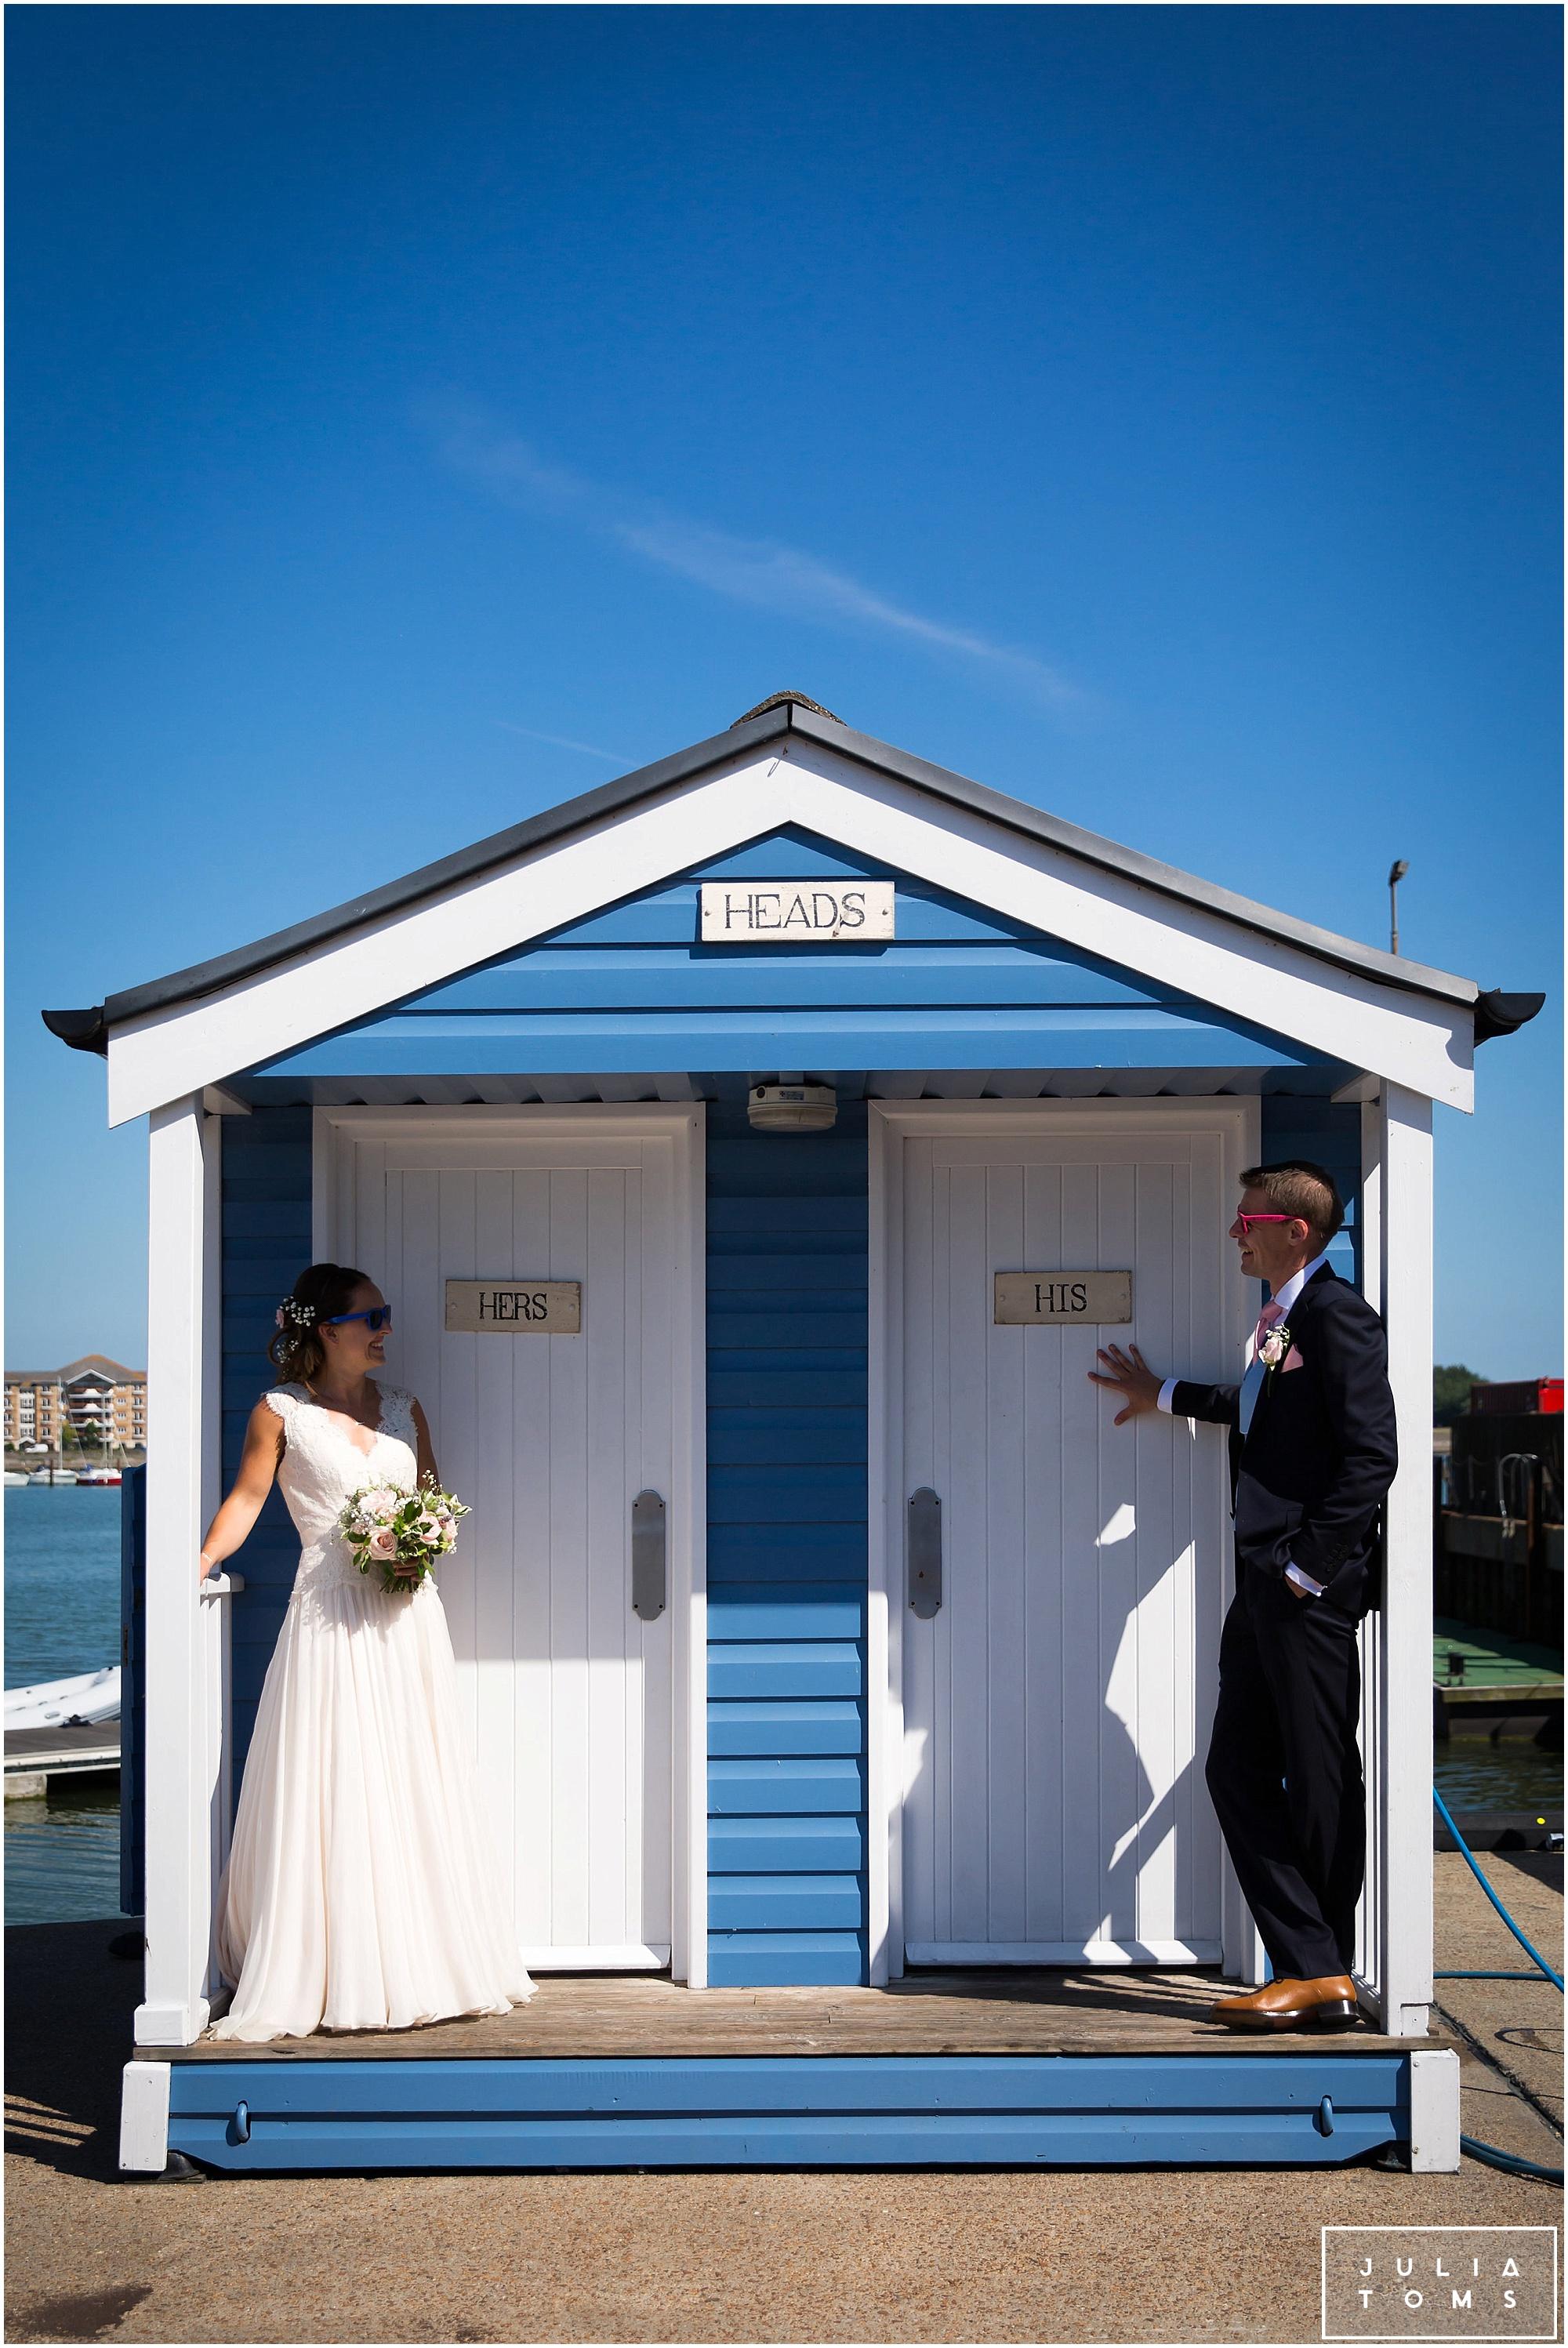 julia_toms_chichester_wedding_photographer_portsmouth_038.jpg